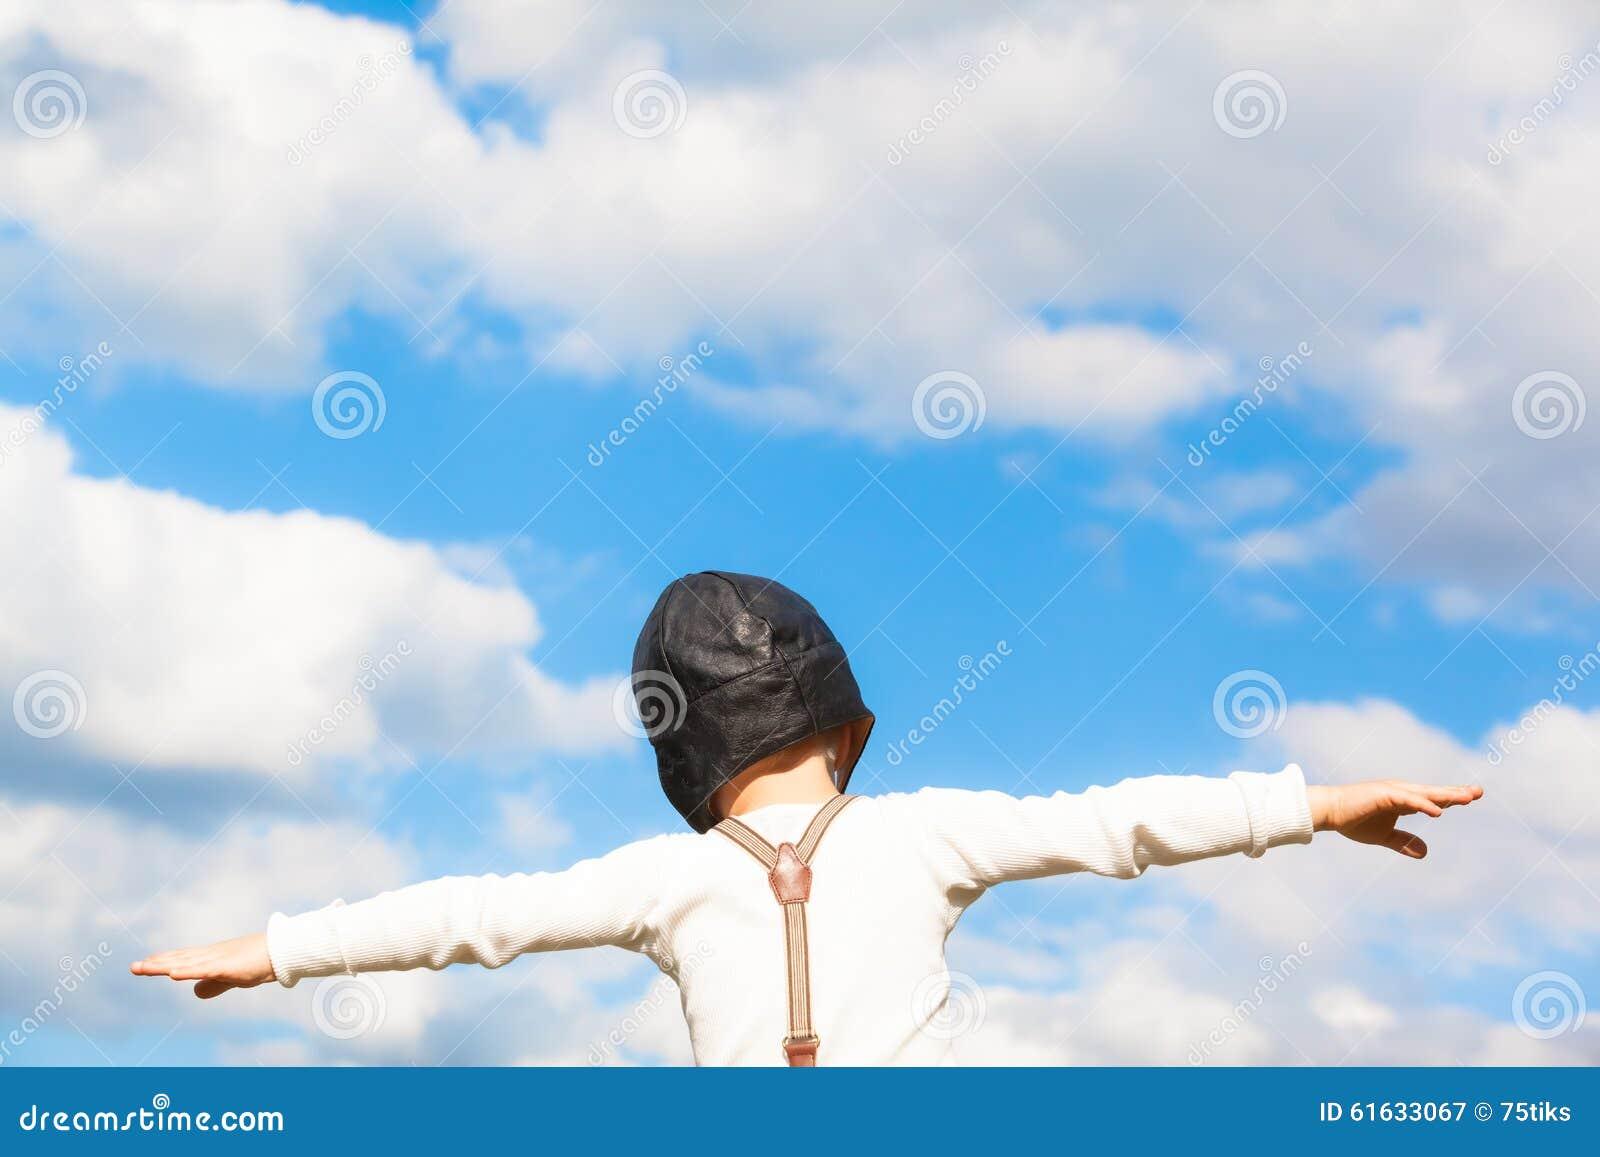 Dream interpretation Suspenders, what dreams Suspenders in a dream to see 56